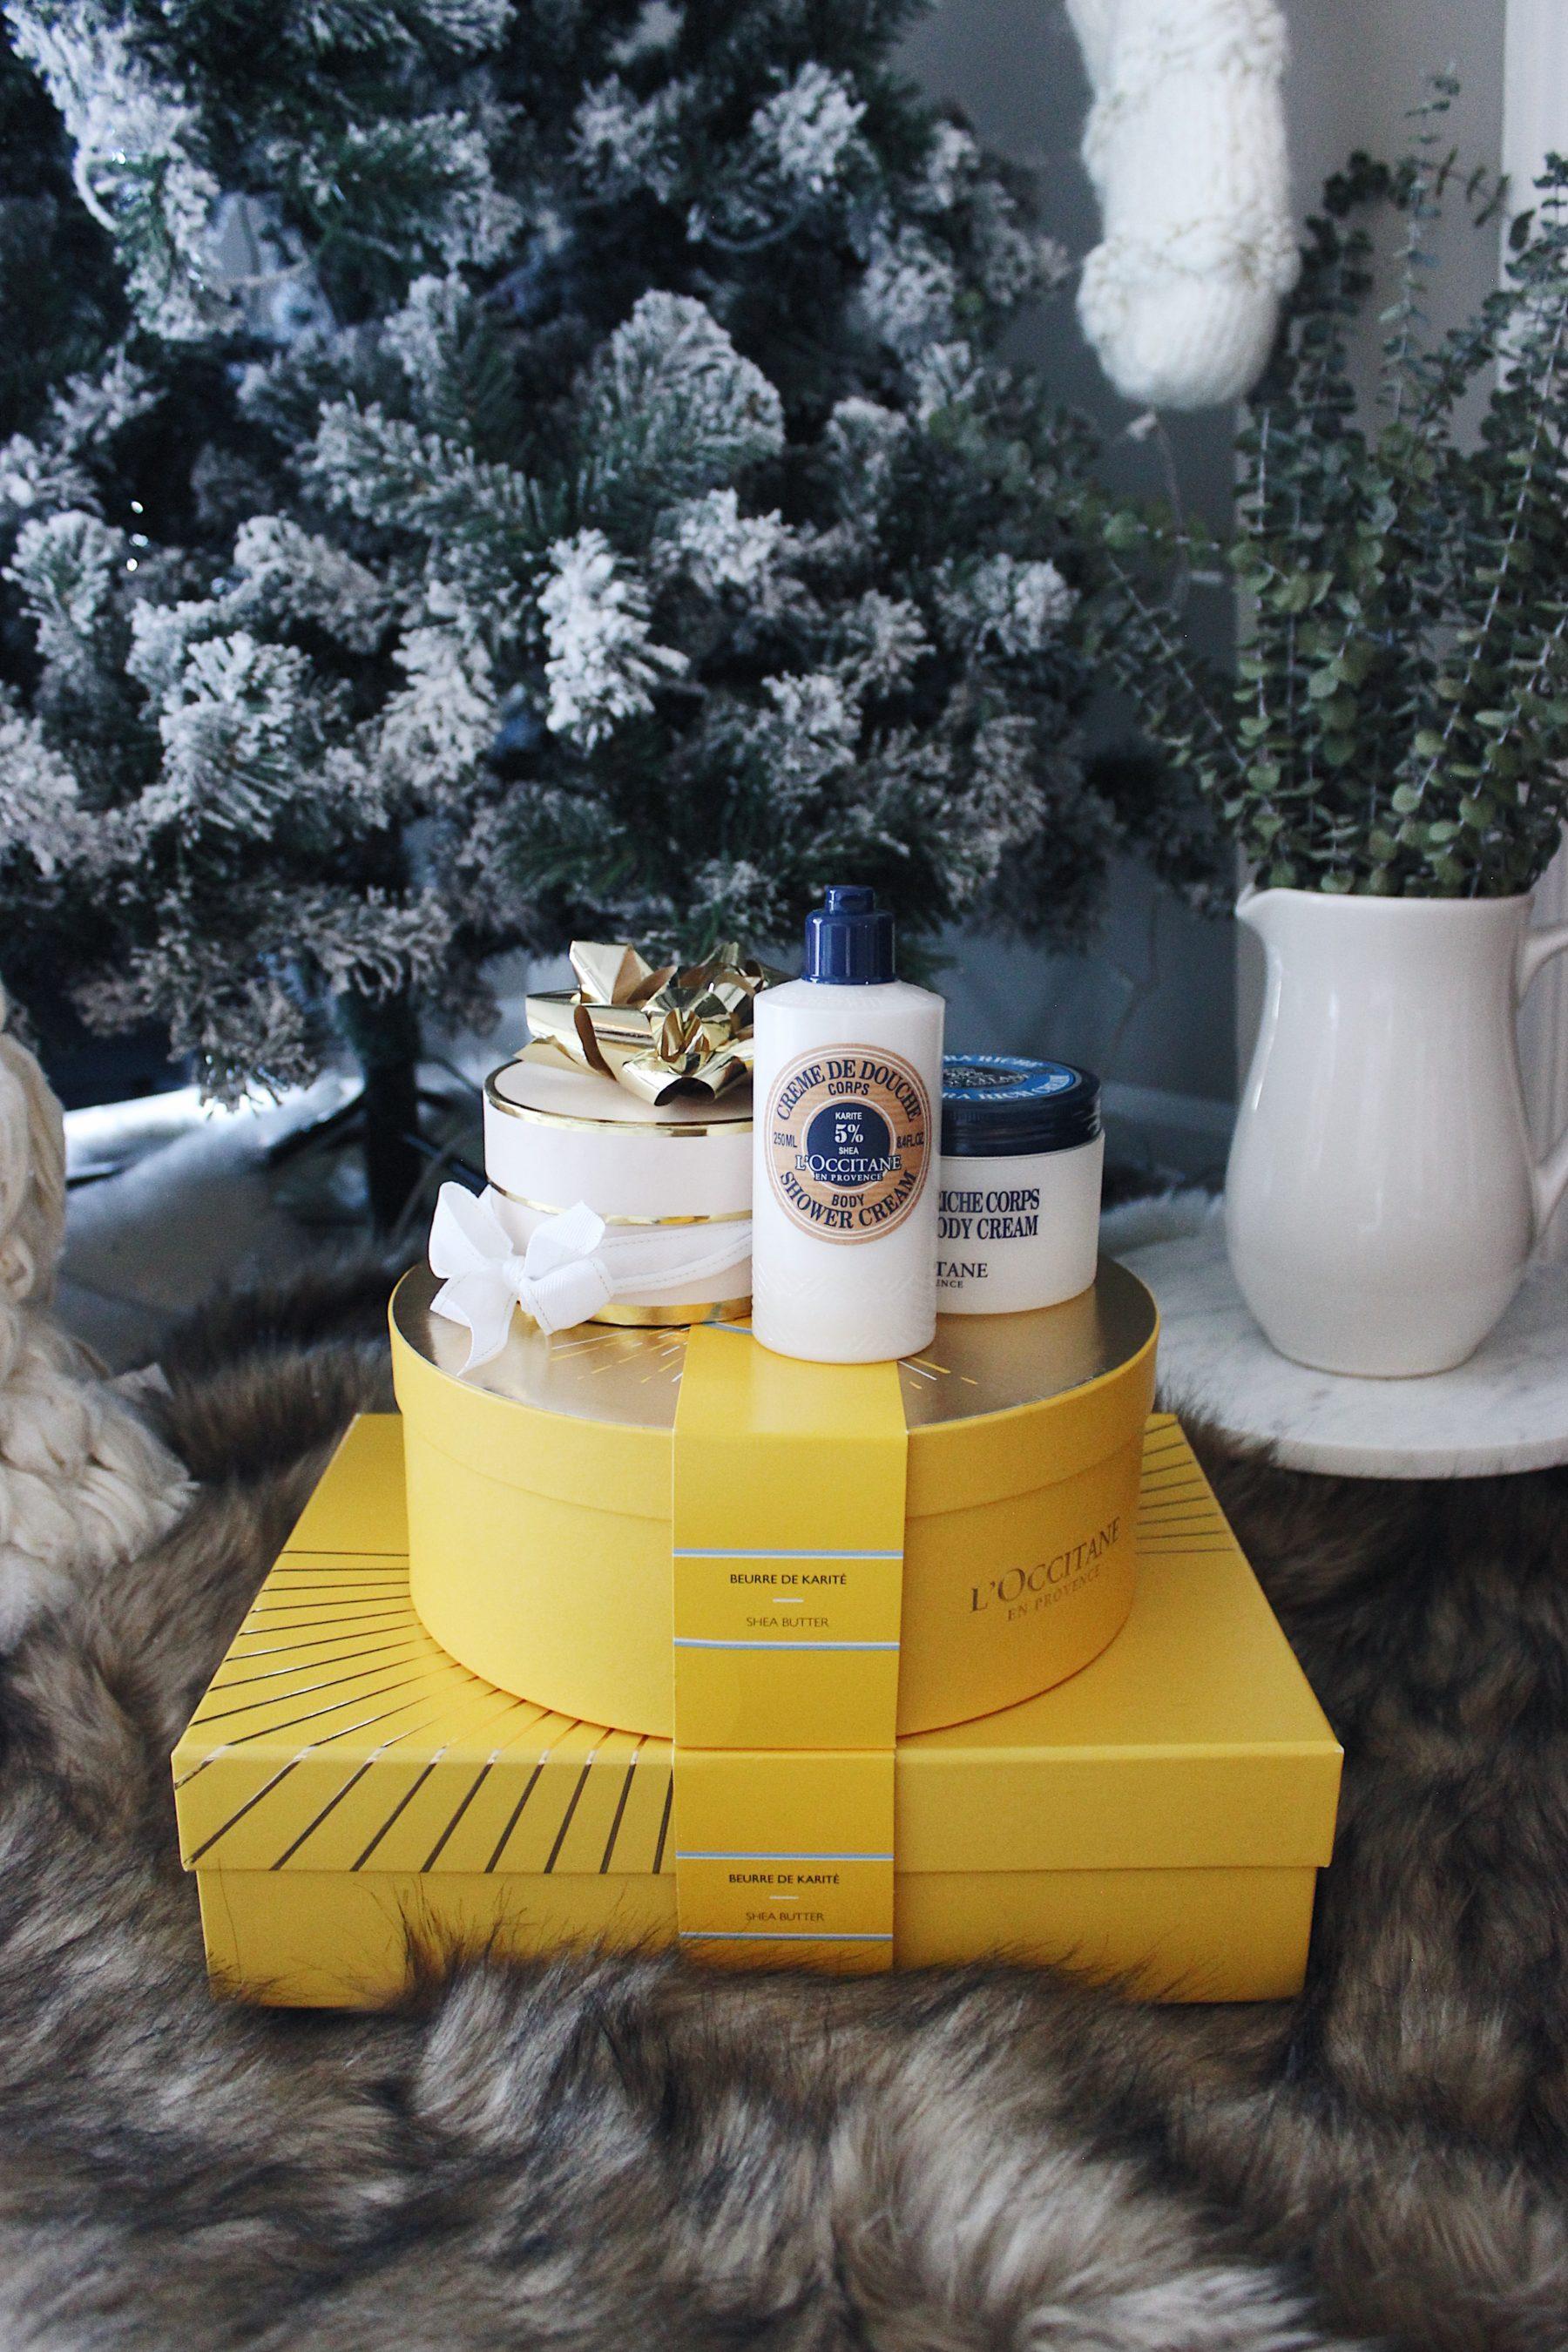 L'Occitane Skincare Gifts